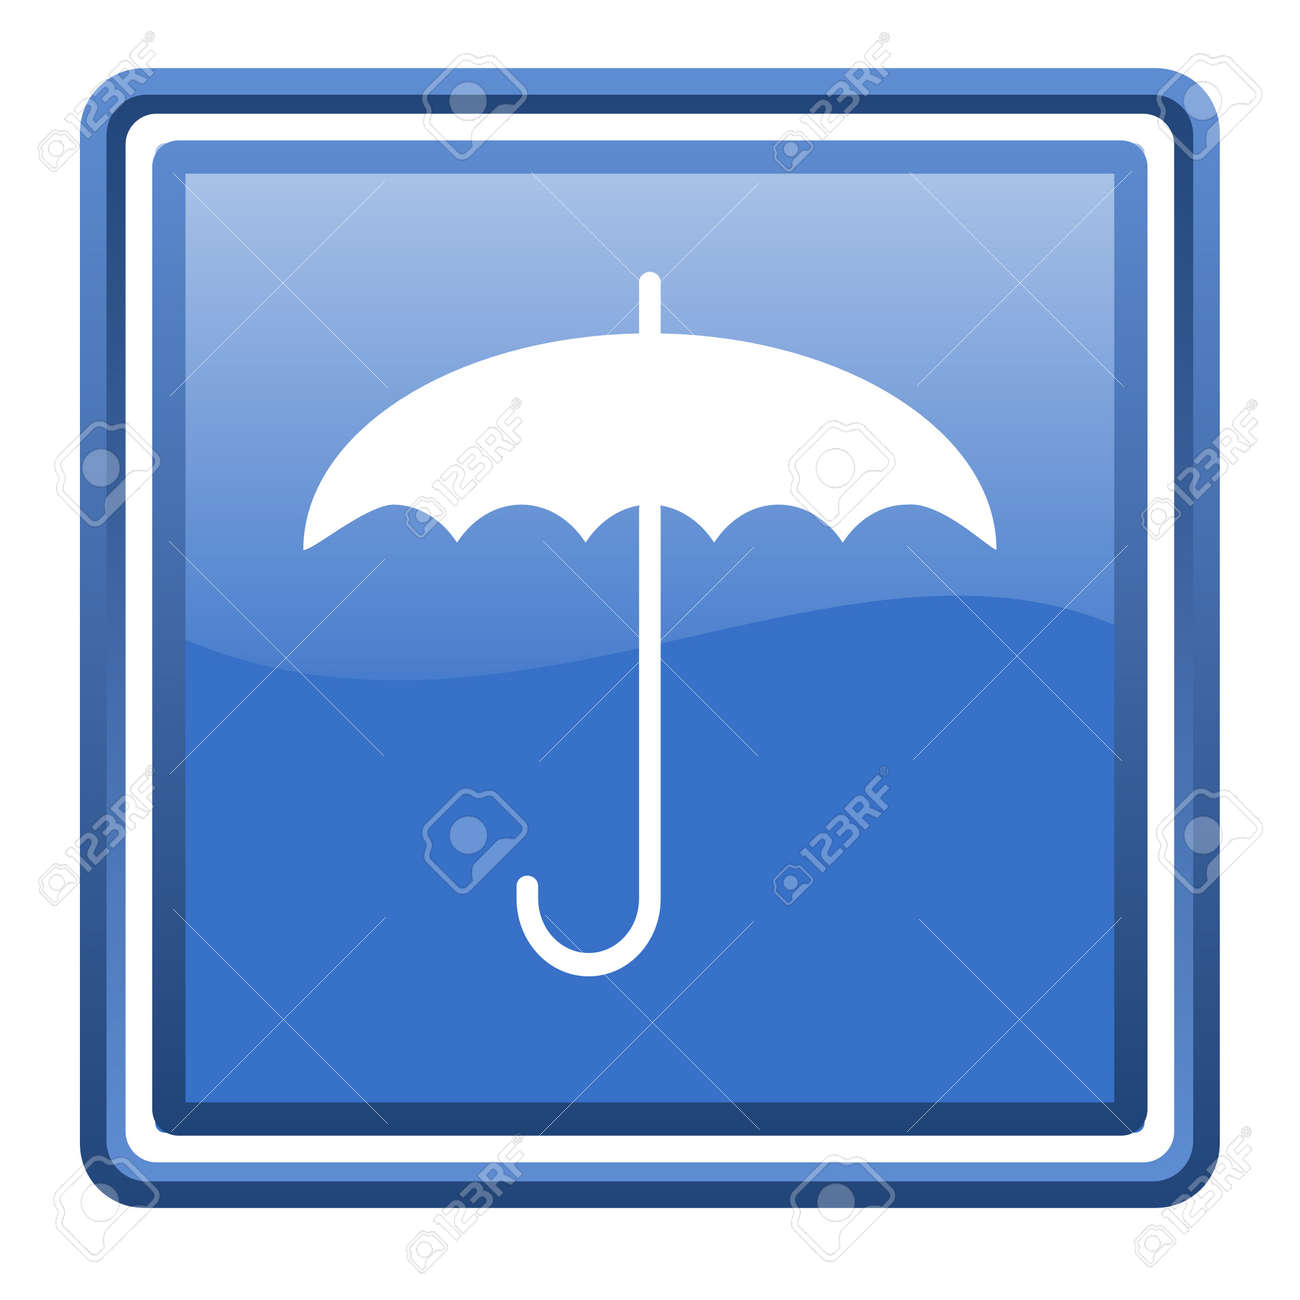 umbrella blue glossy square web icon isolated Stock Photo - 17093050